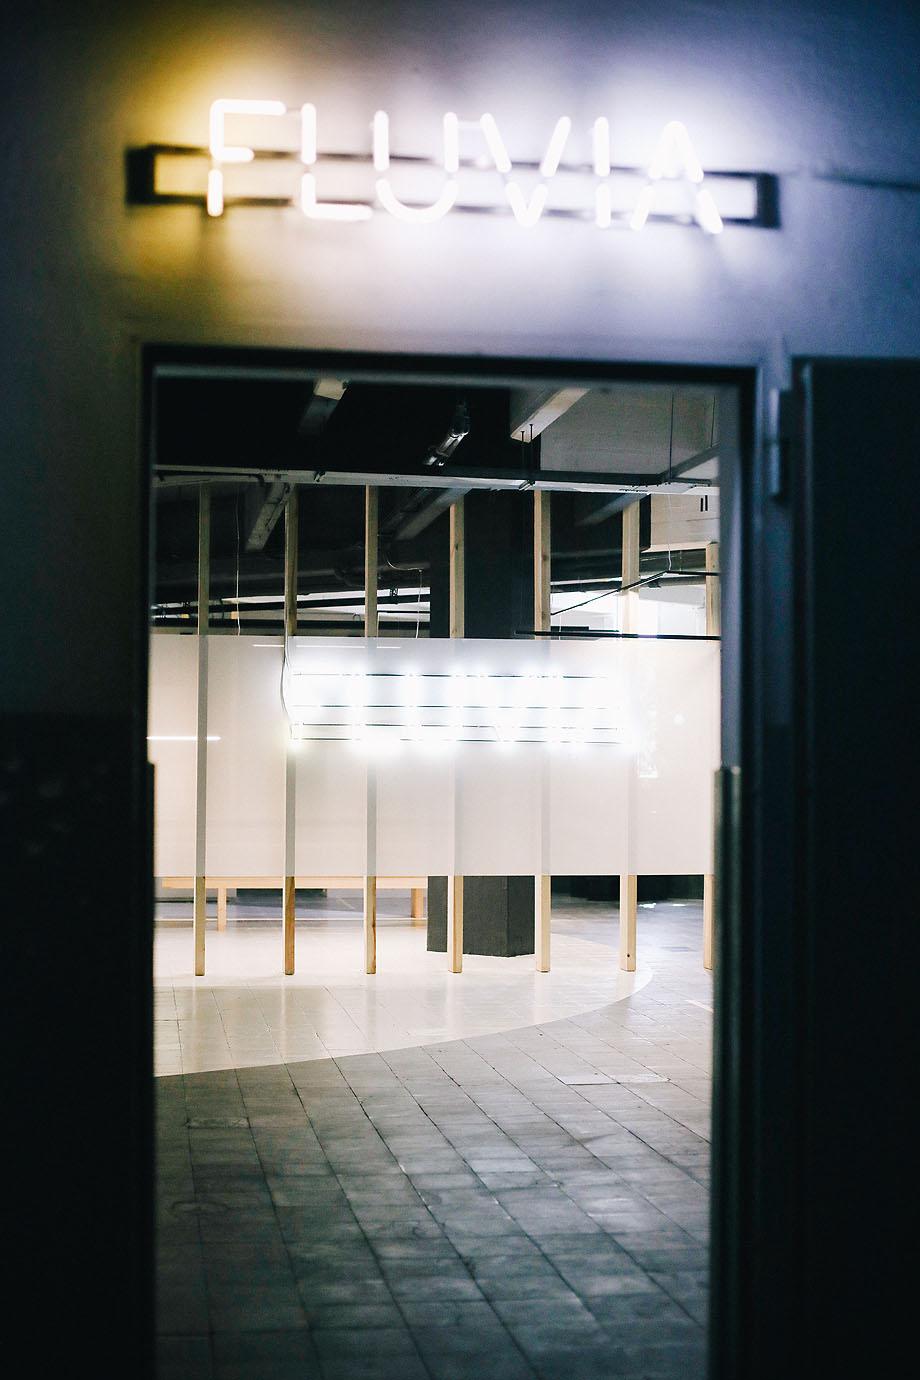 showroom fluvia en poblenou barcelona (14)